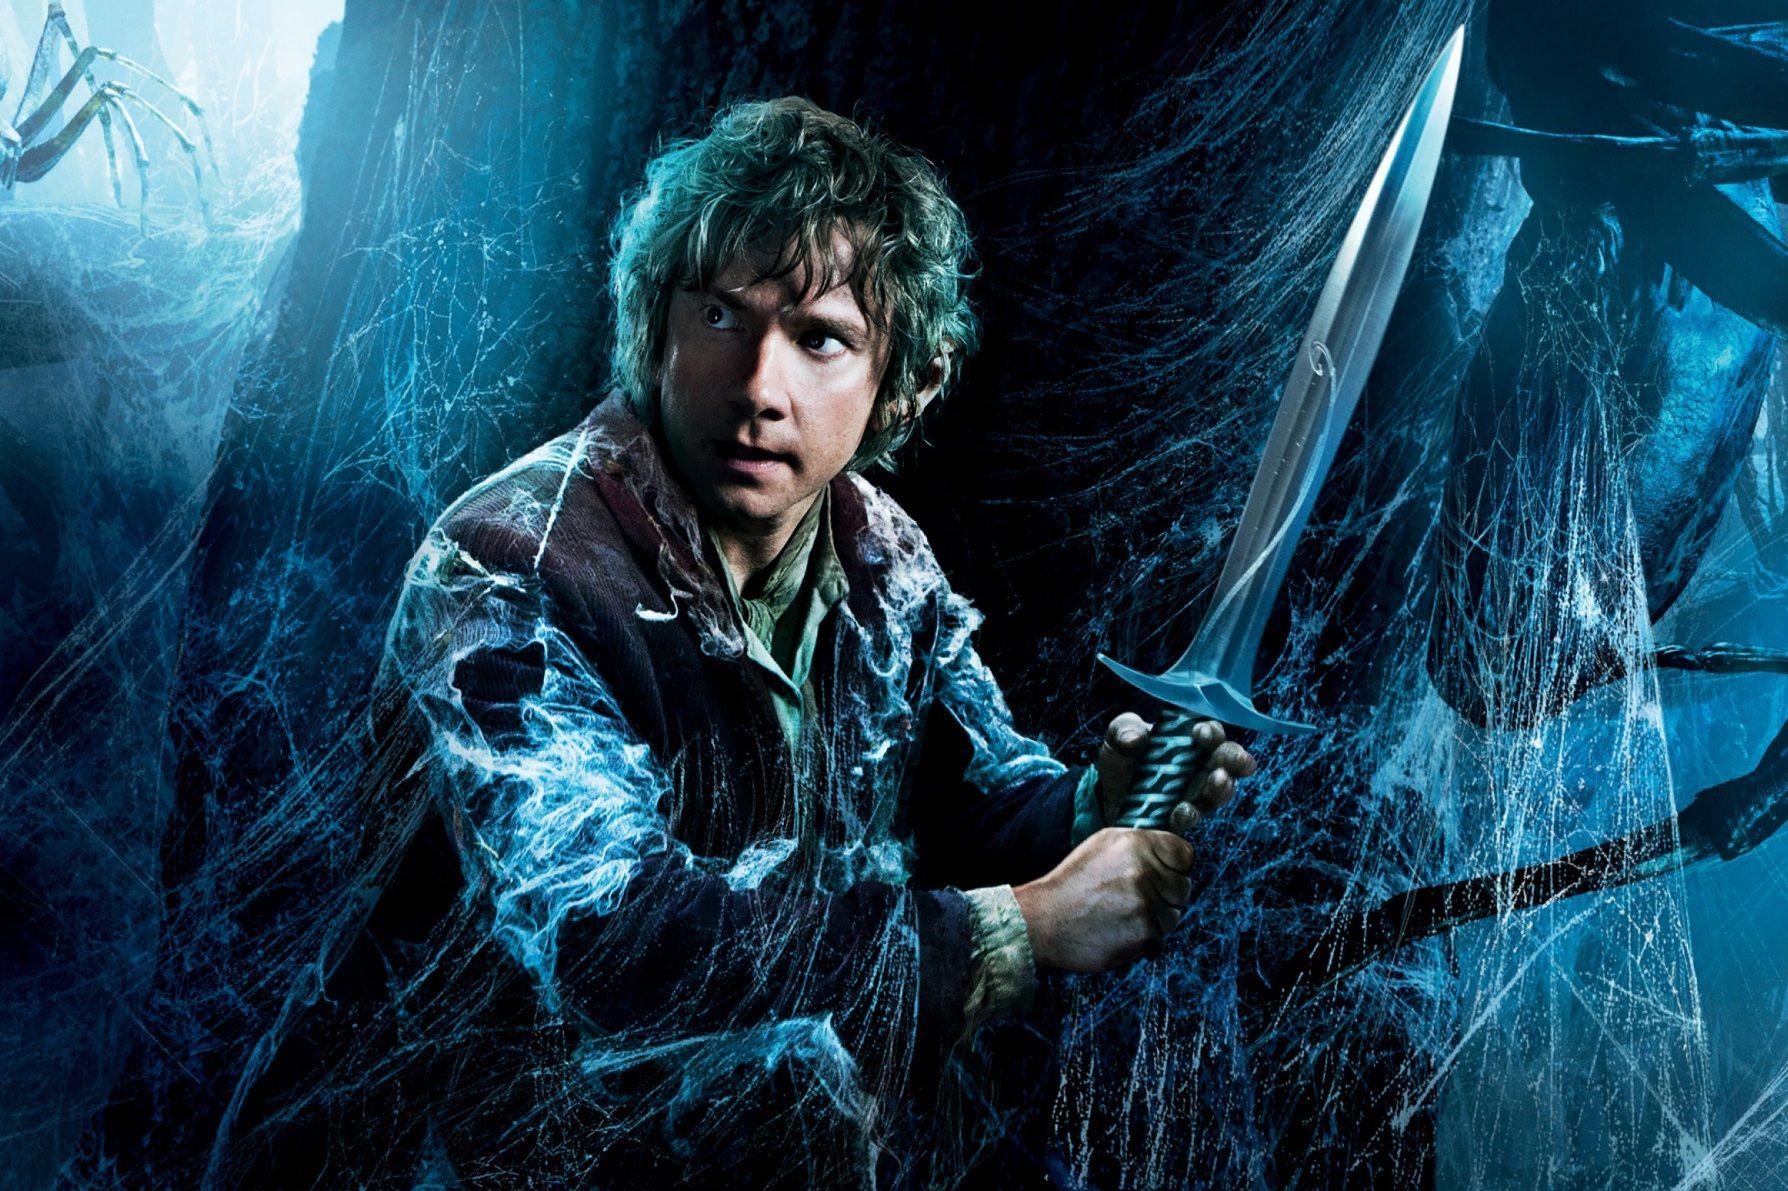 The Hobbit -The Desolation of Smaug